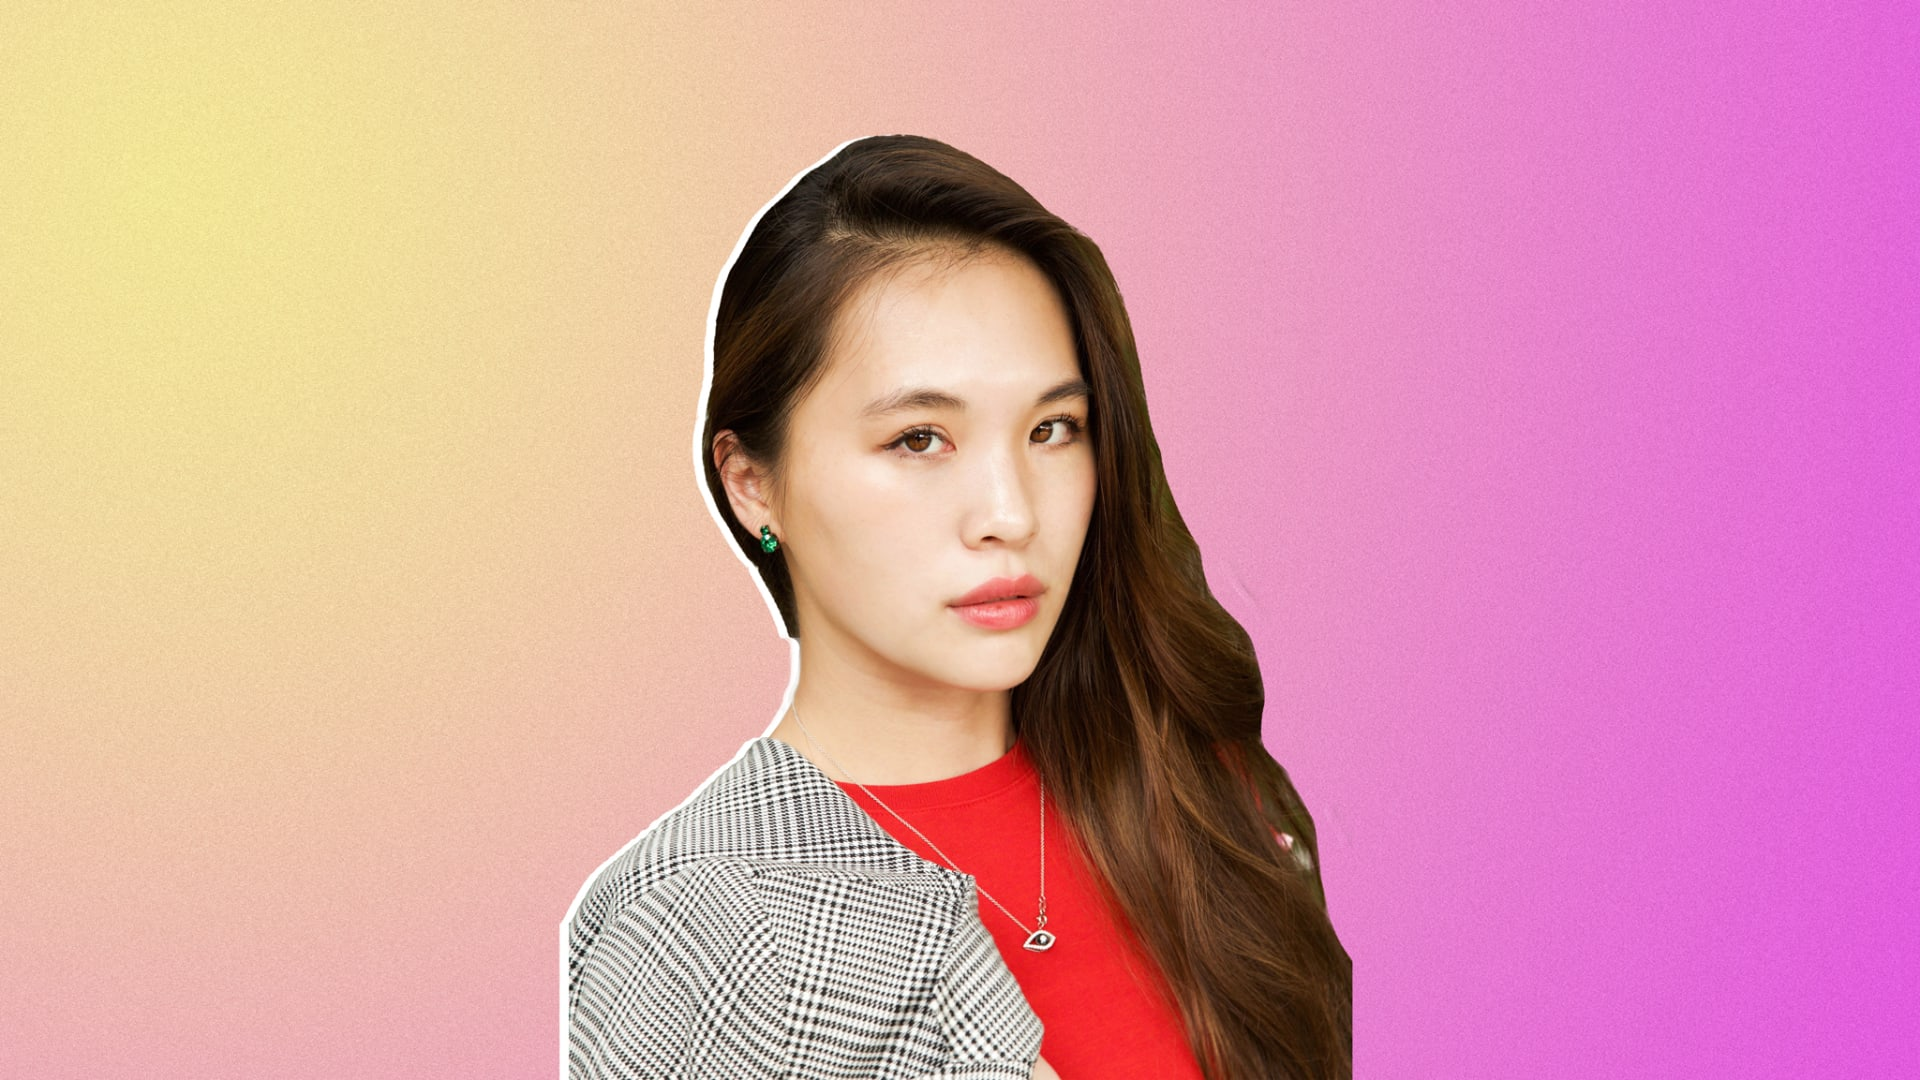 Celine Tien, founder of Flowly.